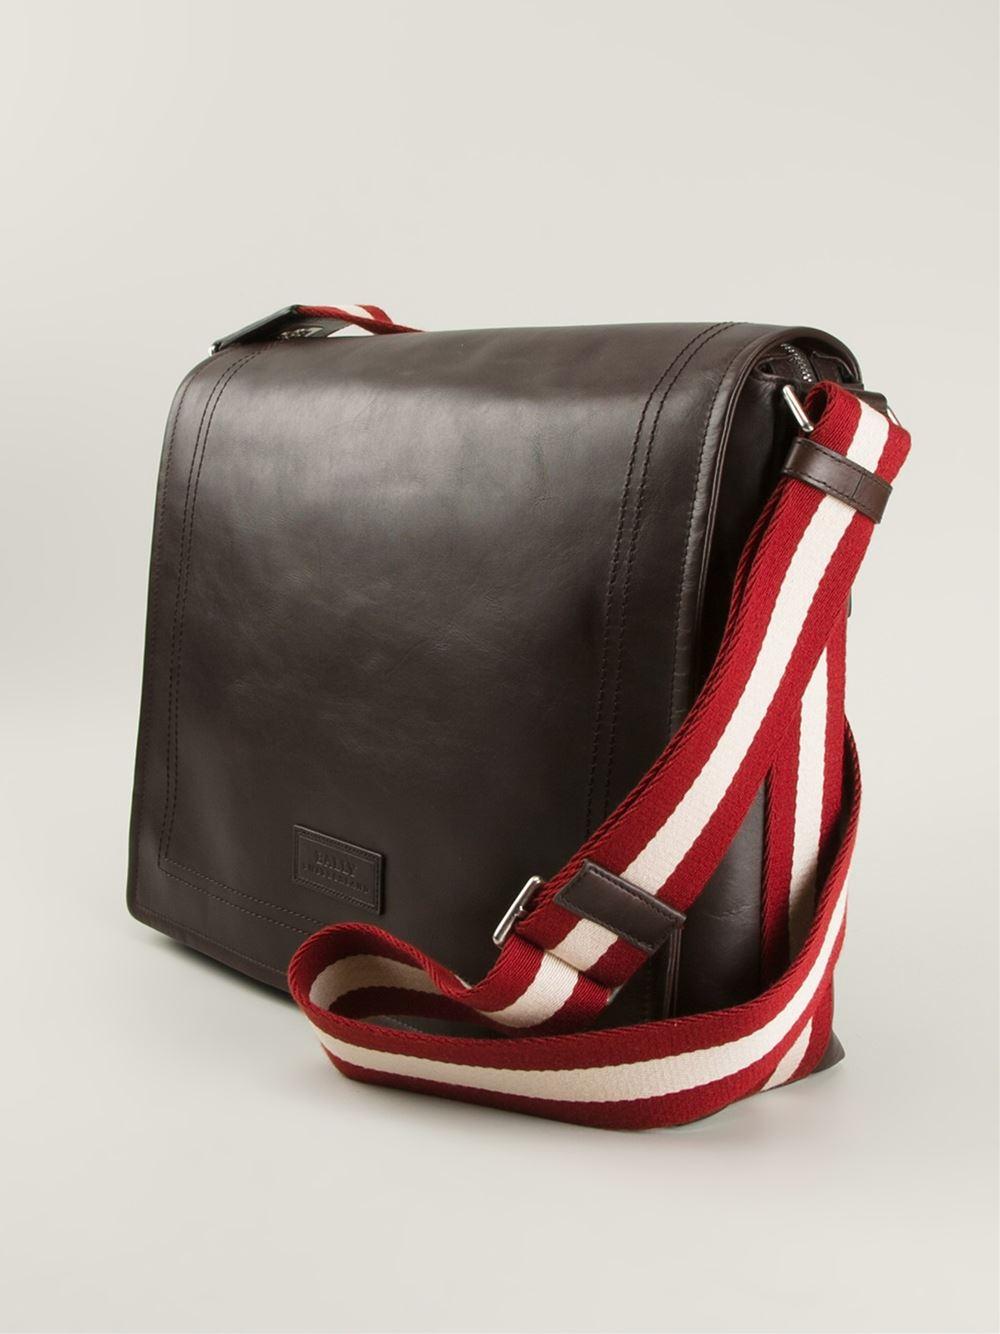 c7d812c6f8f8 Bally Medium Triar Messenger Bag in Brown for Men - Lyst